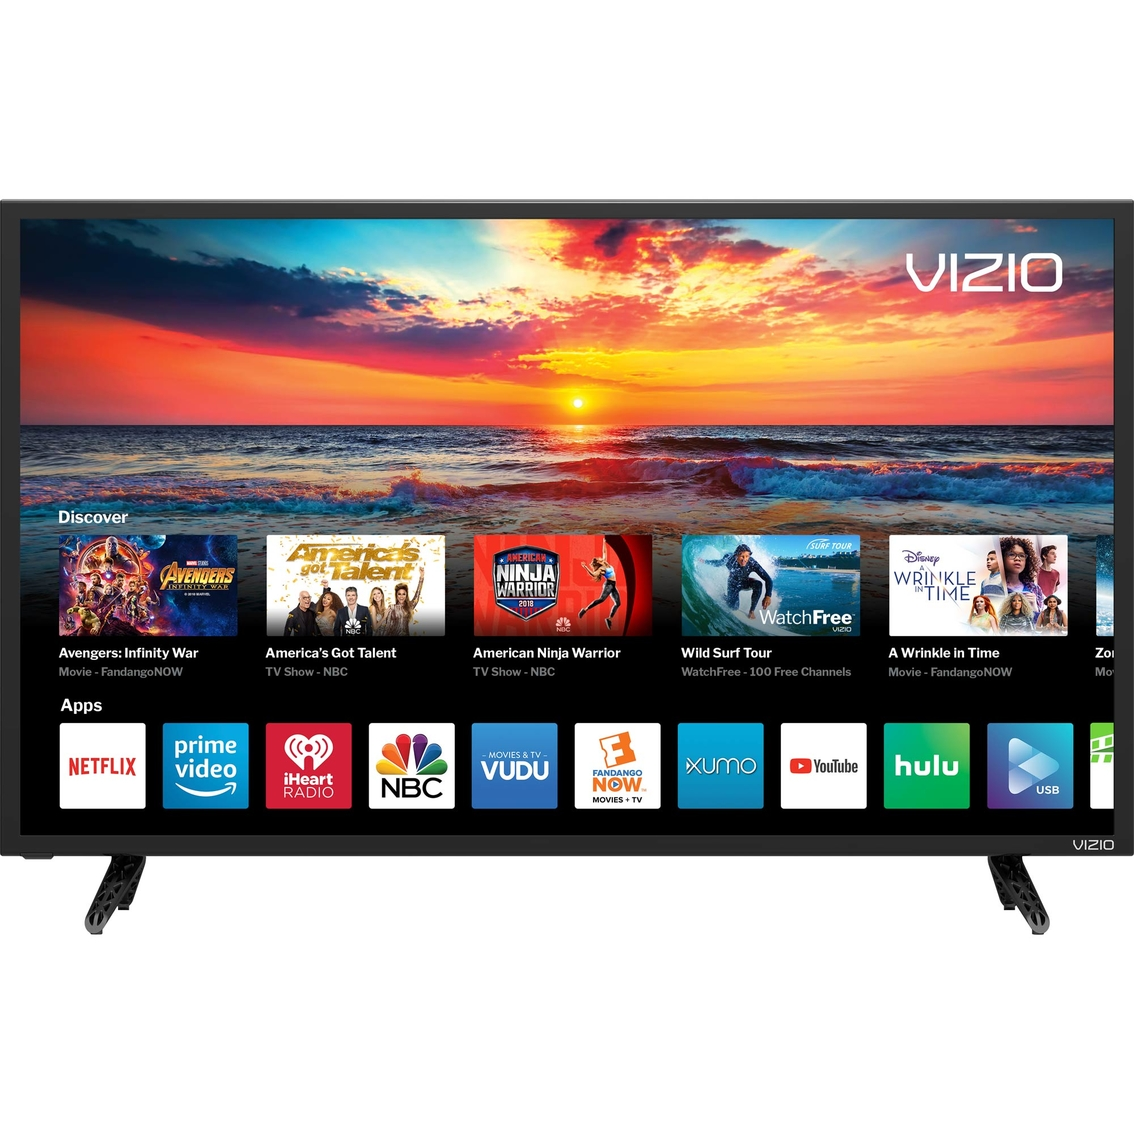 Vizio 43 In  1080p Led 120hz Smart Tv D43f-f1   Tvs   Electronics